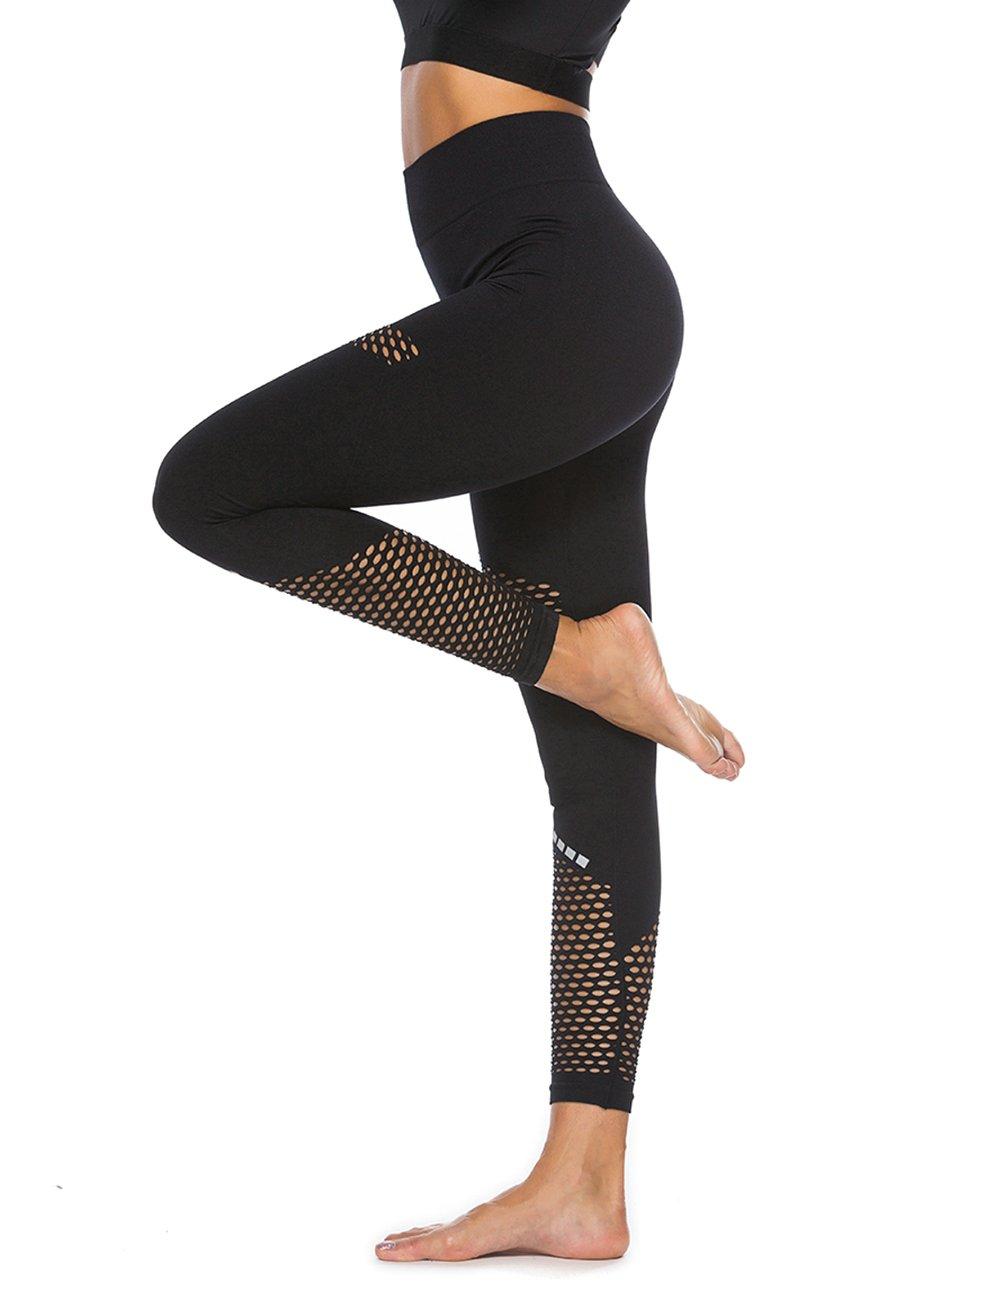 LaLaAreal Mallas Deportivas Mujer Pantalones Pirata Leggins Deportes para  Running Yoga Fitness Gym e48acfcb30951